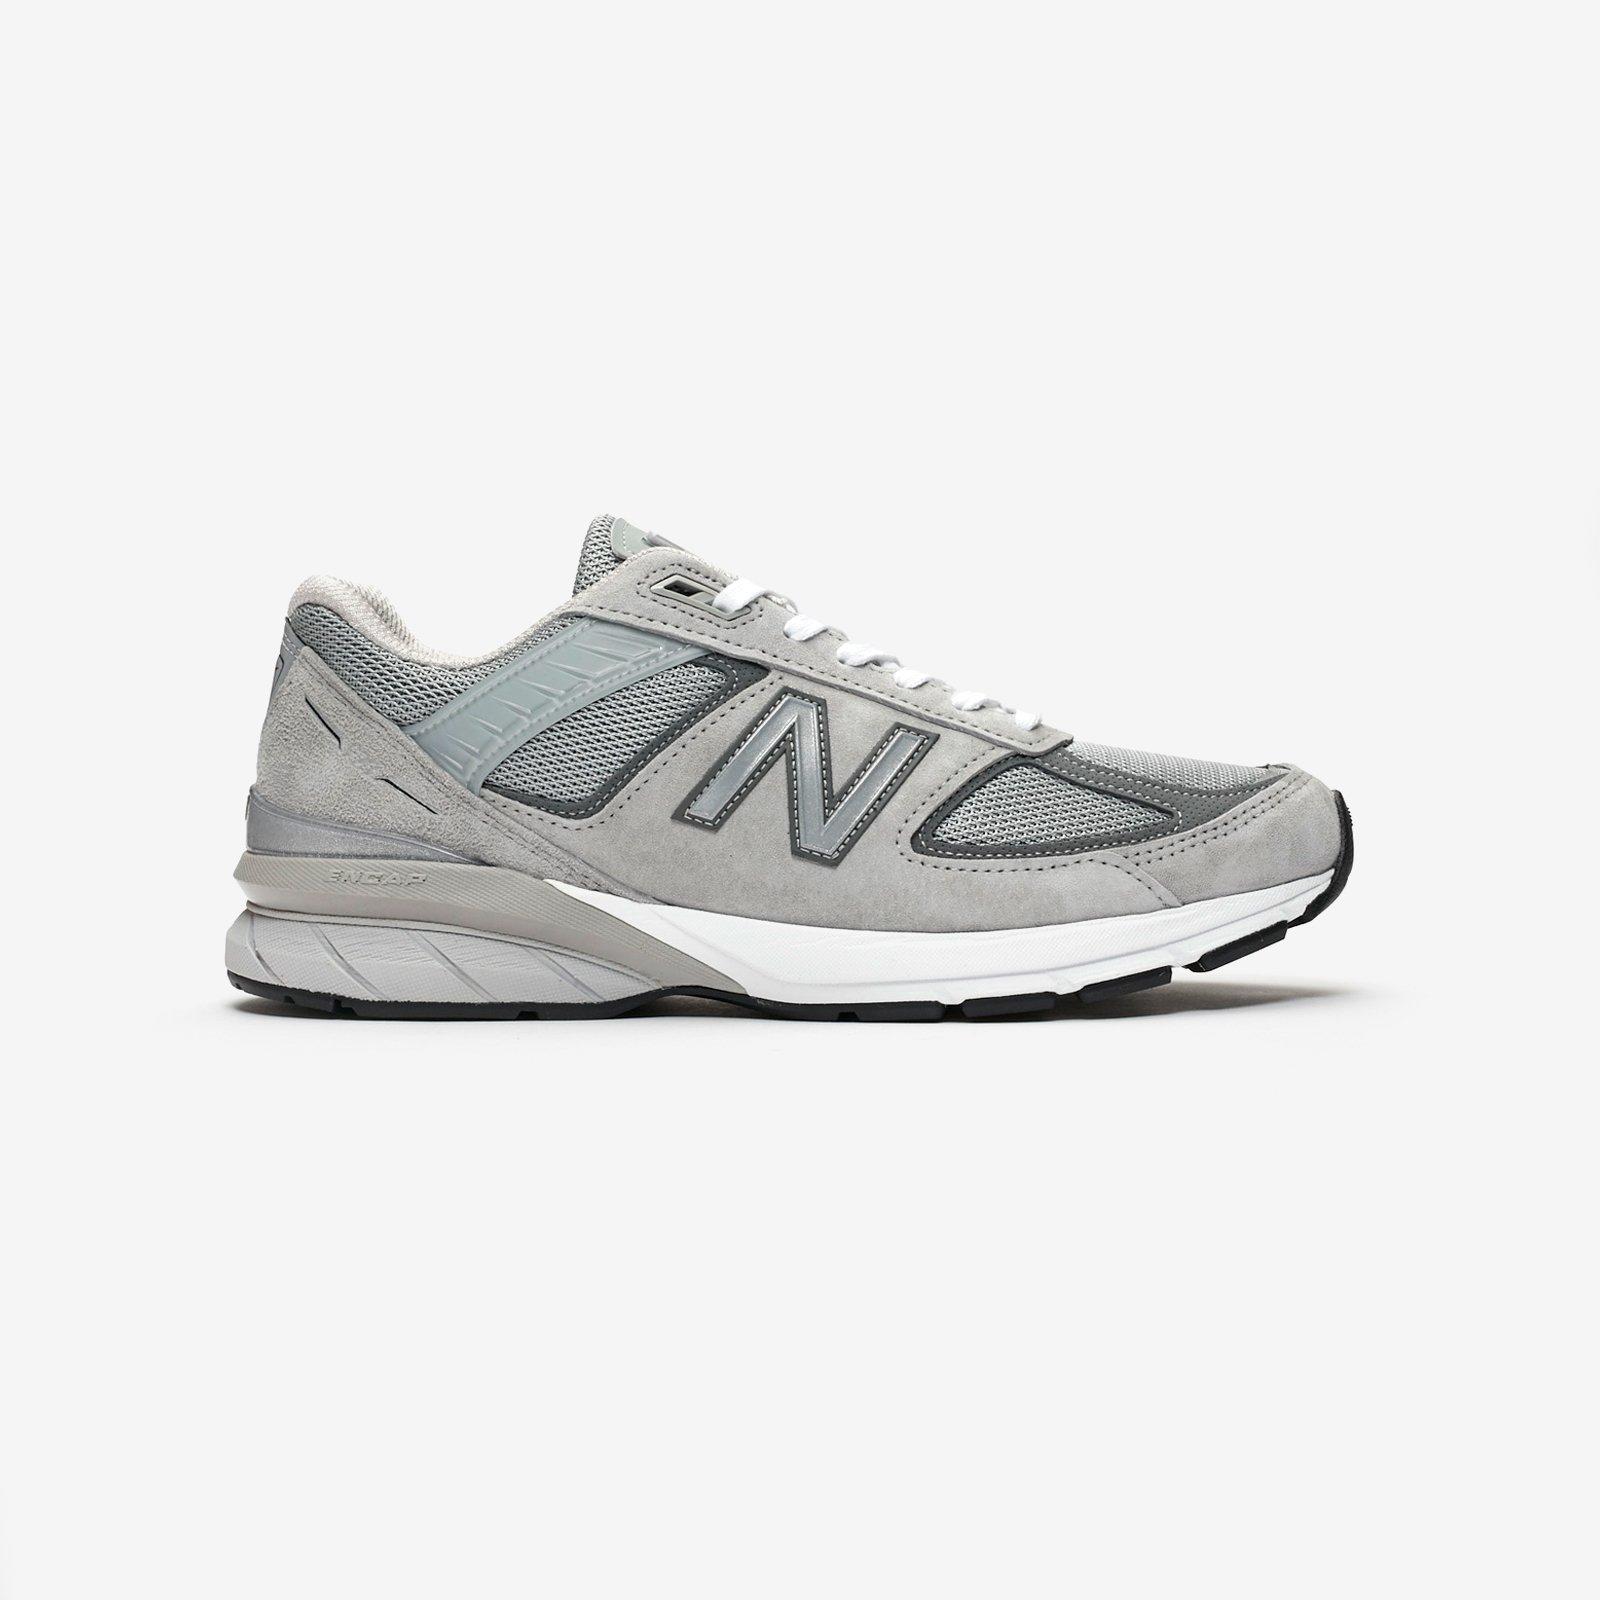 New Balance M990 - M990gl5 - SNS   sneakers & streetwear online ...